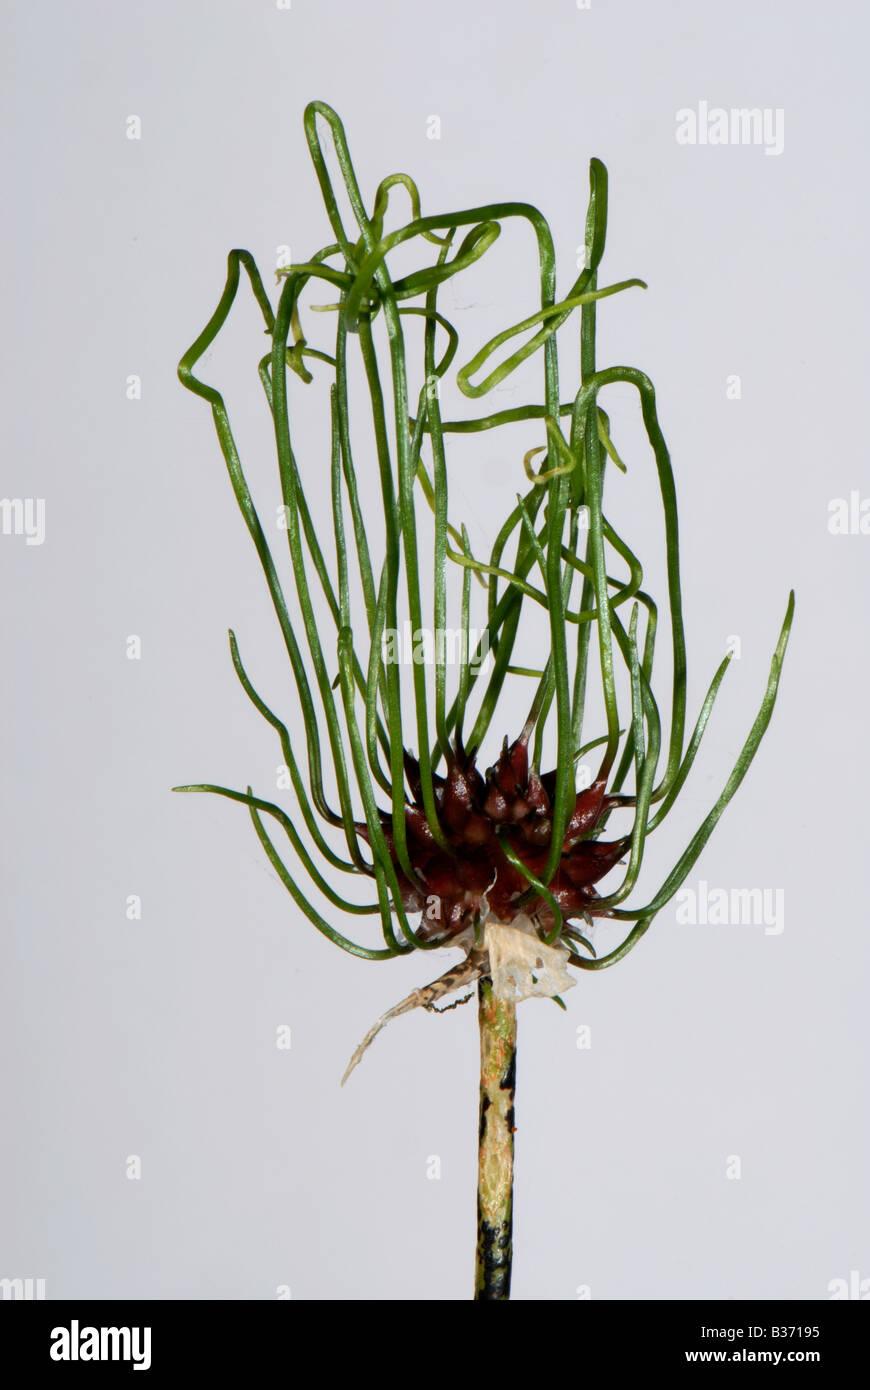 Flowerhead of crow garlic Allium vineale showing germinating bulbils - Stock Image